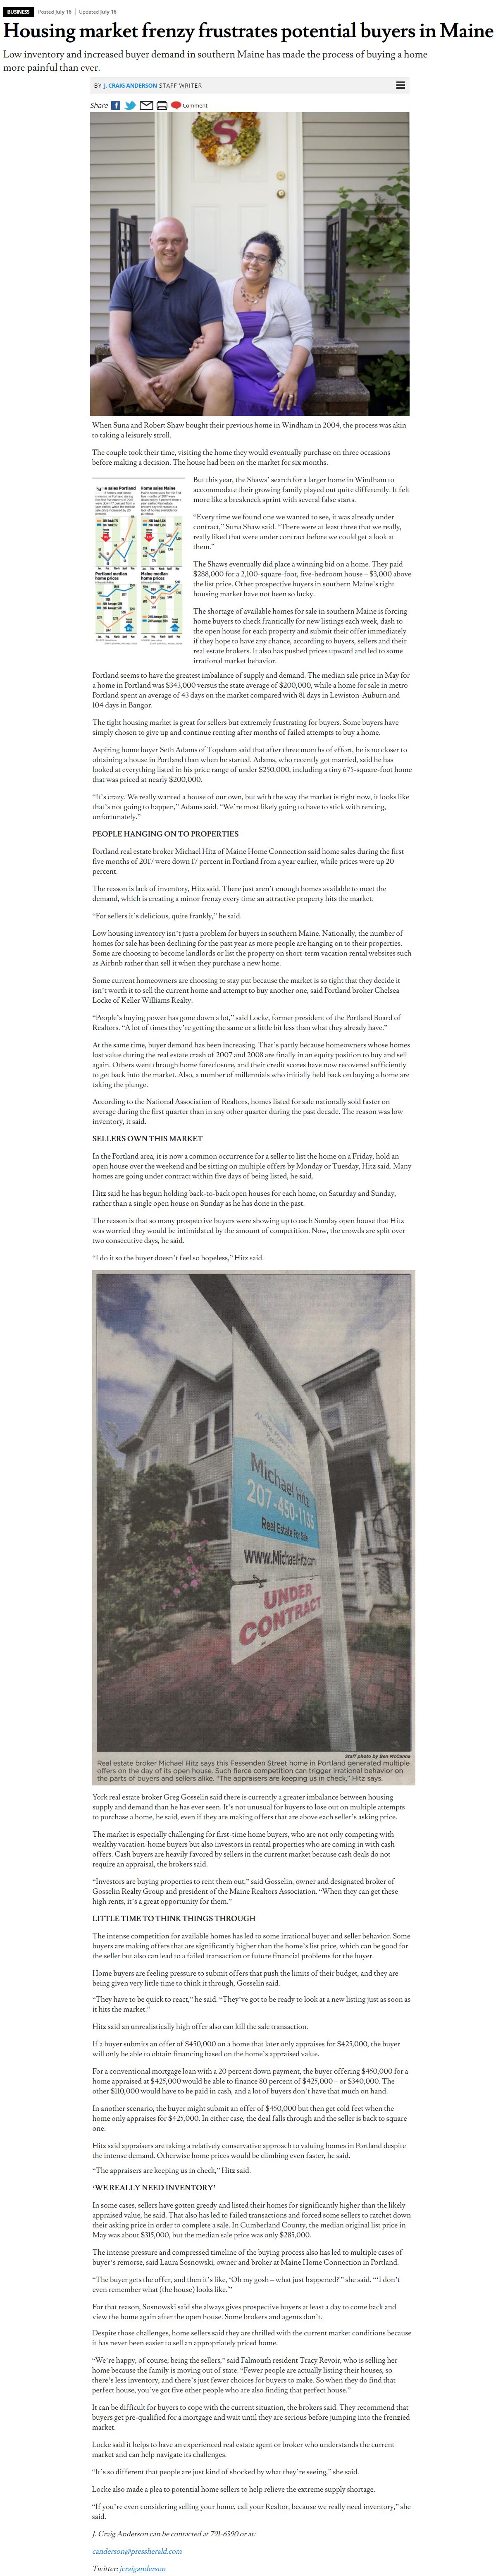 Sunday-Telegram-Article.png